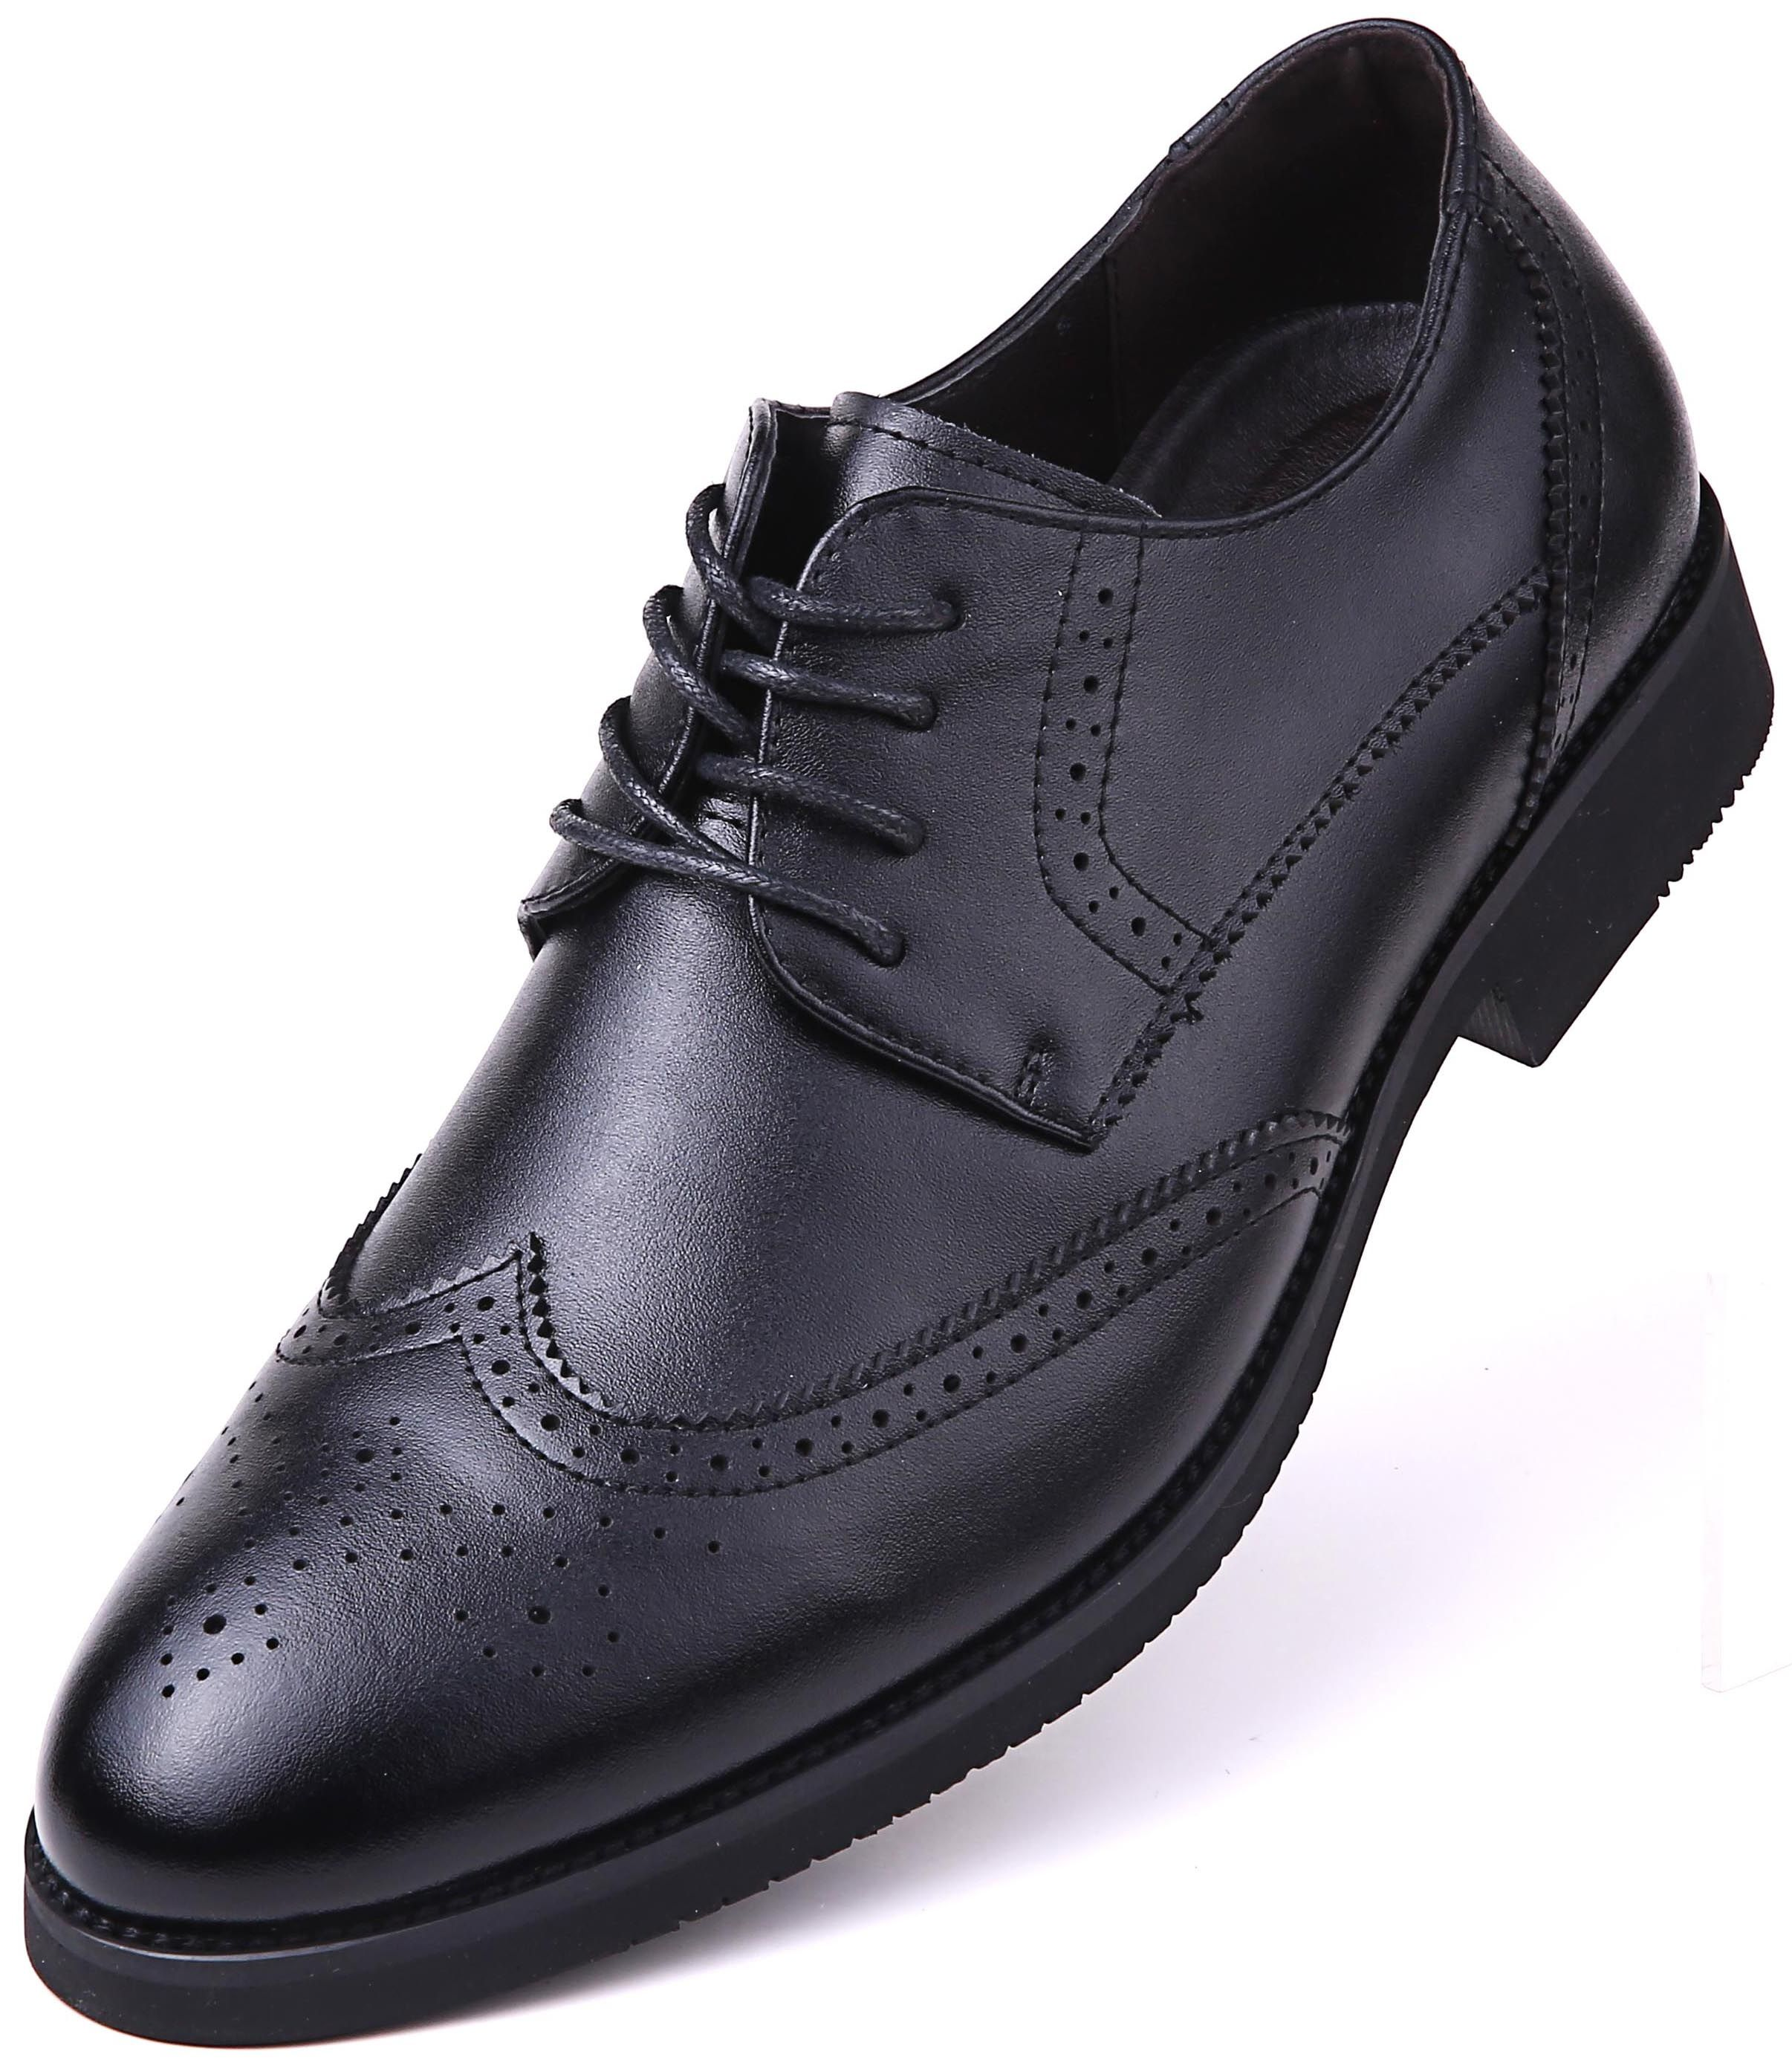 Mio Marino Mio Marino Dressports Wingtip Shoes For Men Walmart Com Mens Wedding Shoes Black Dress Shoes Wingtip Shoes [ 2772 x 2412 Pixel ]